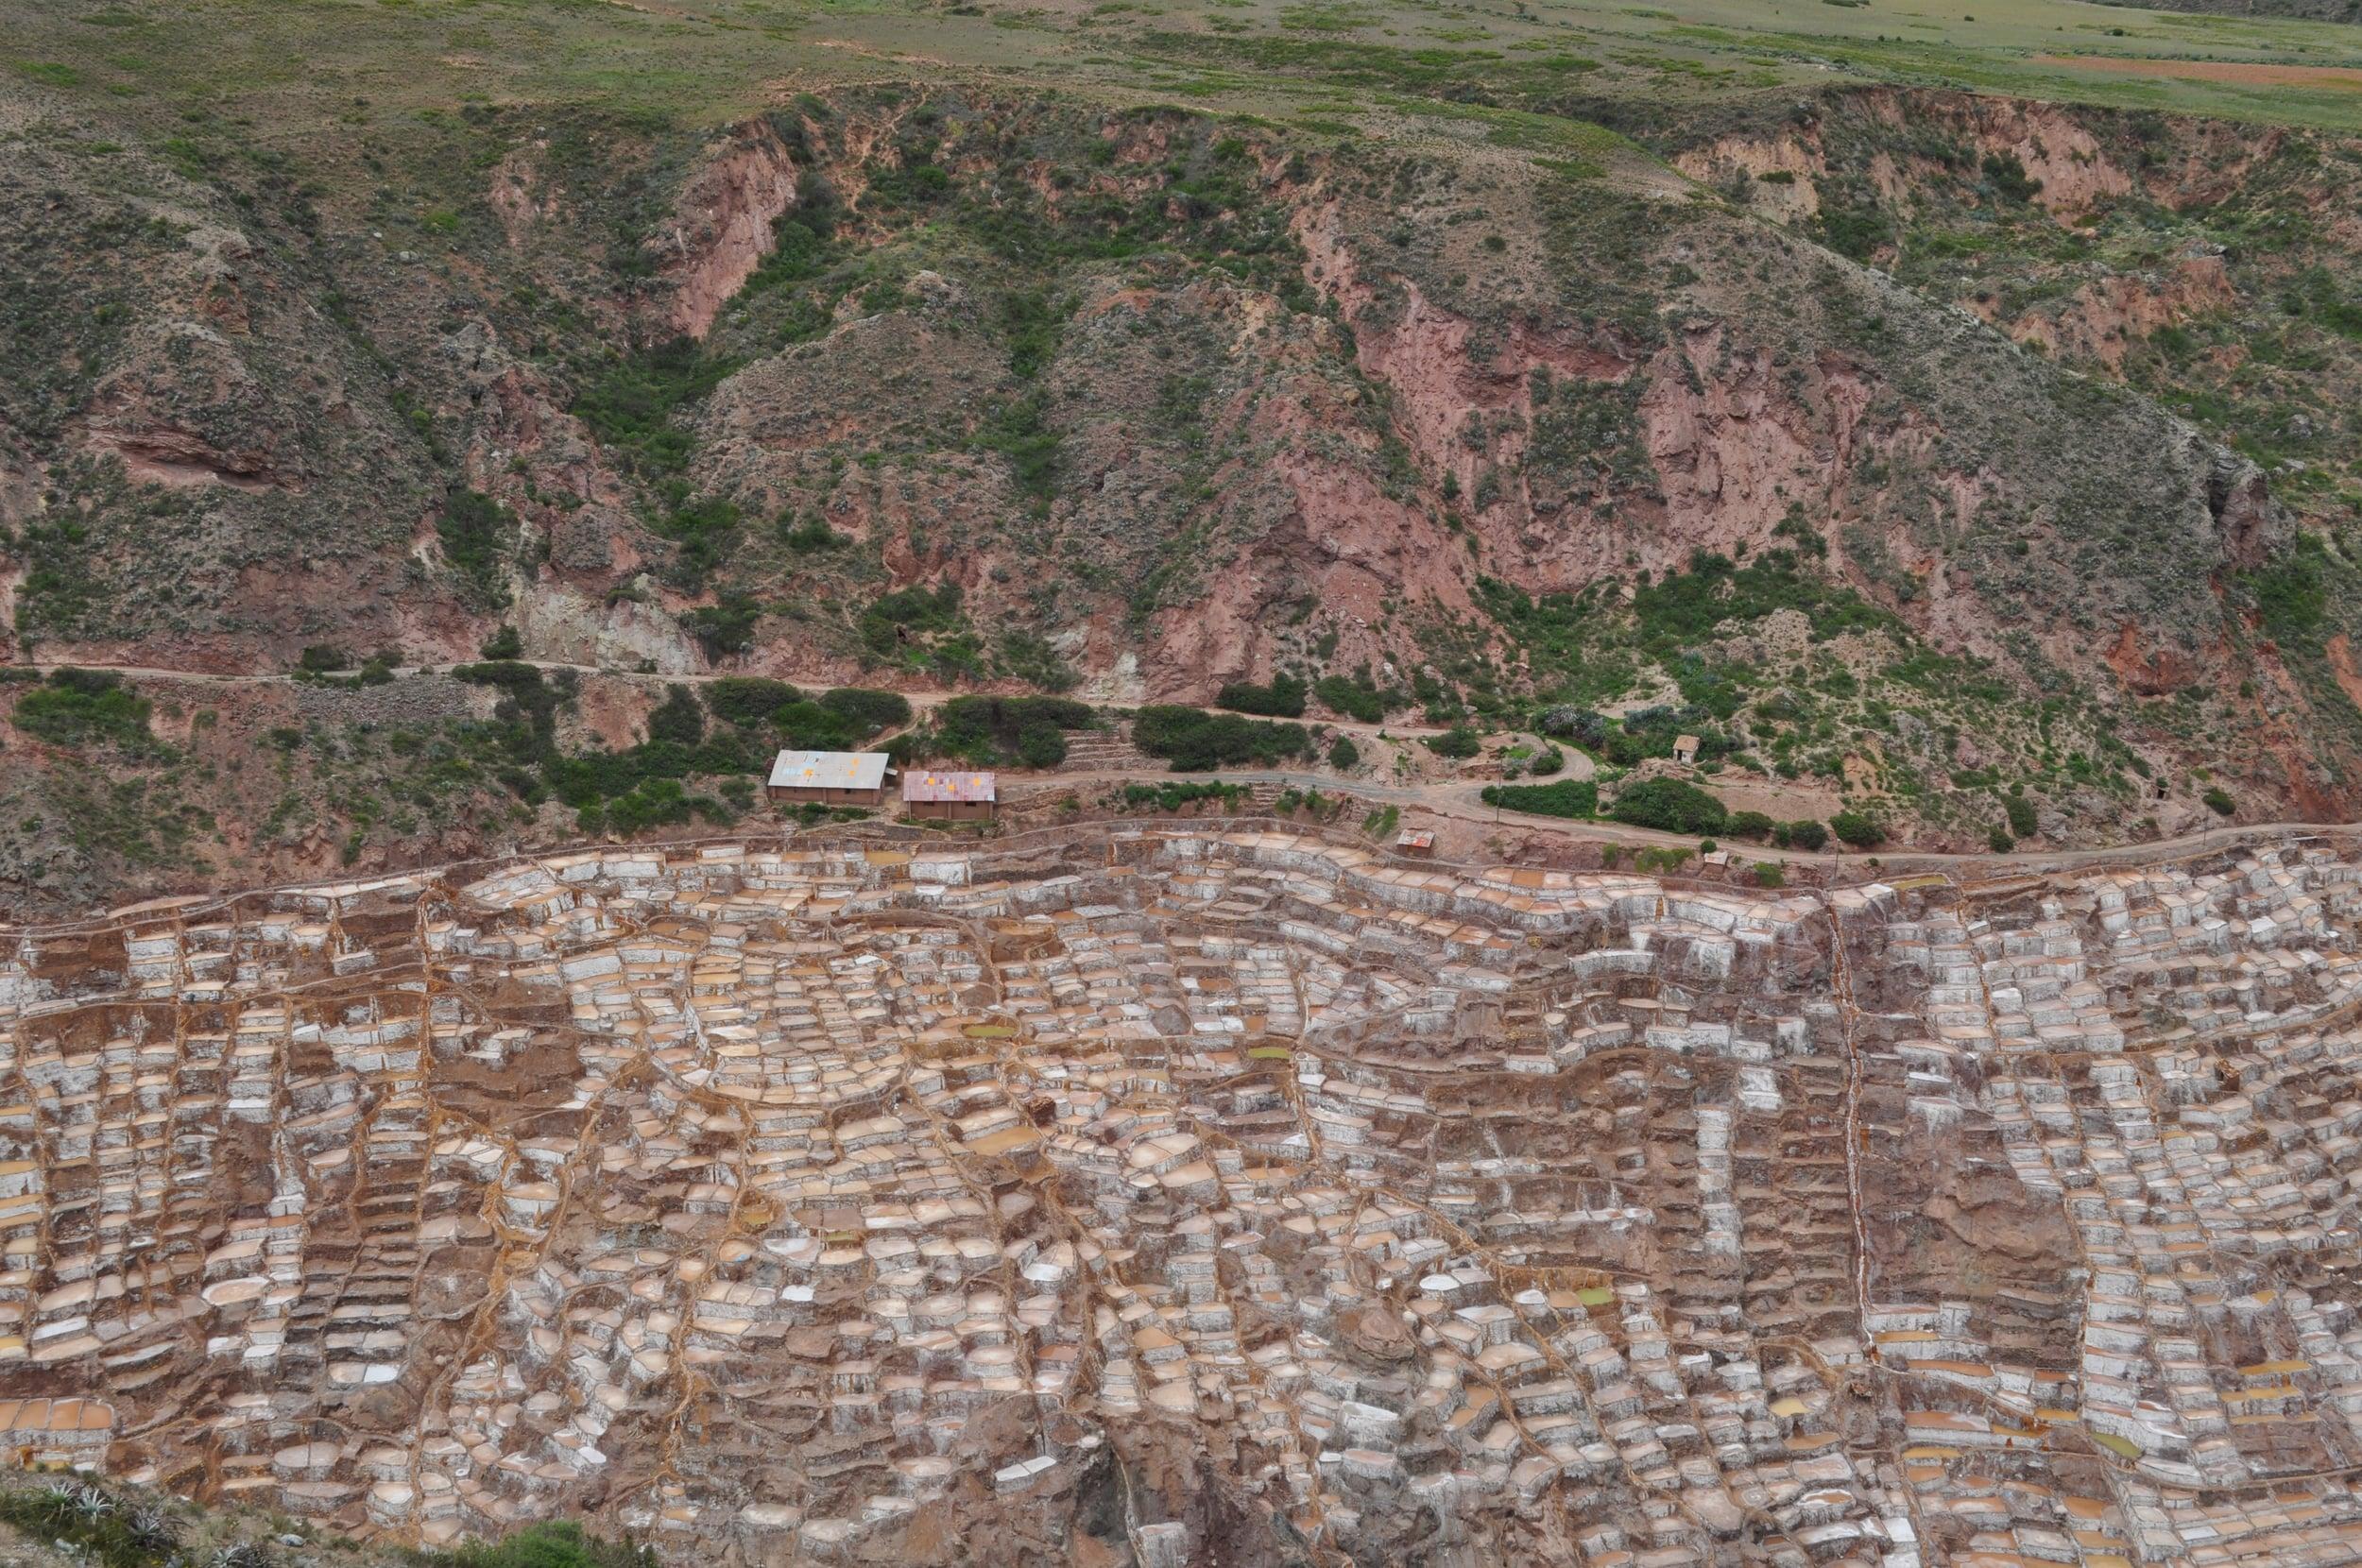 The Salt flats date back to the Inca period. Photo: Pamy Rojas